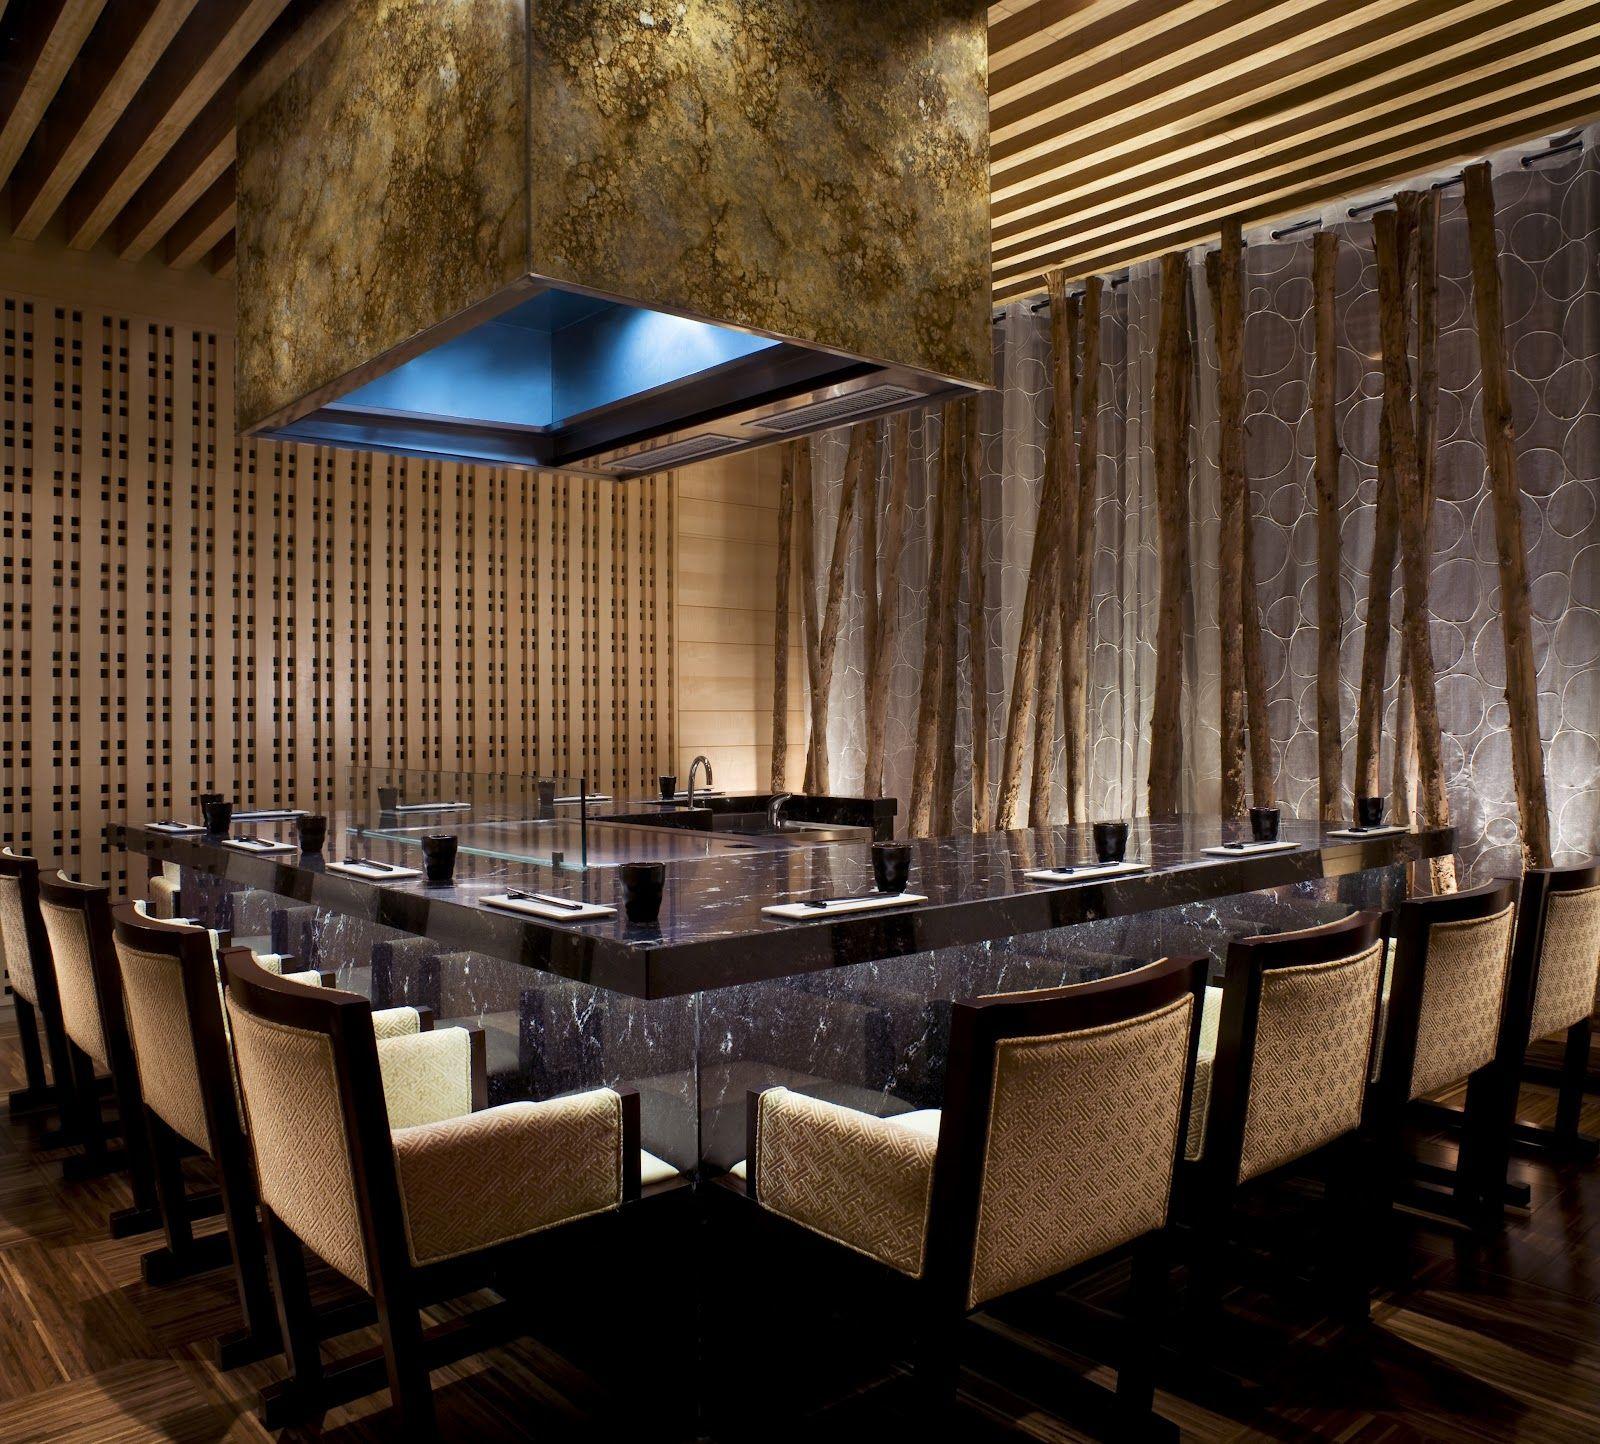 Japanese Kitchen Design: Eiji Nakamura 中村 榮治: Teppanyaki -鉄板焼き-